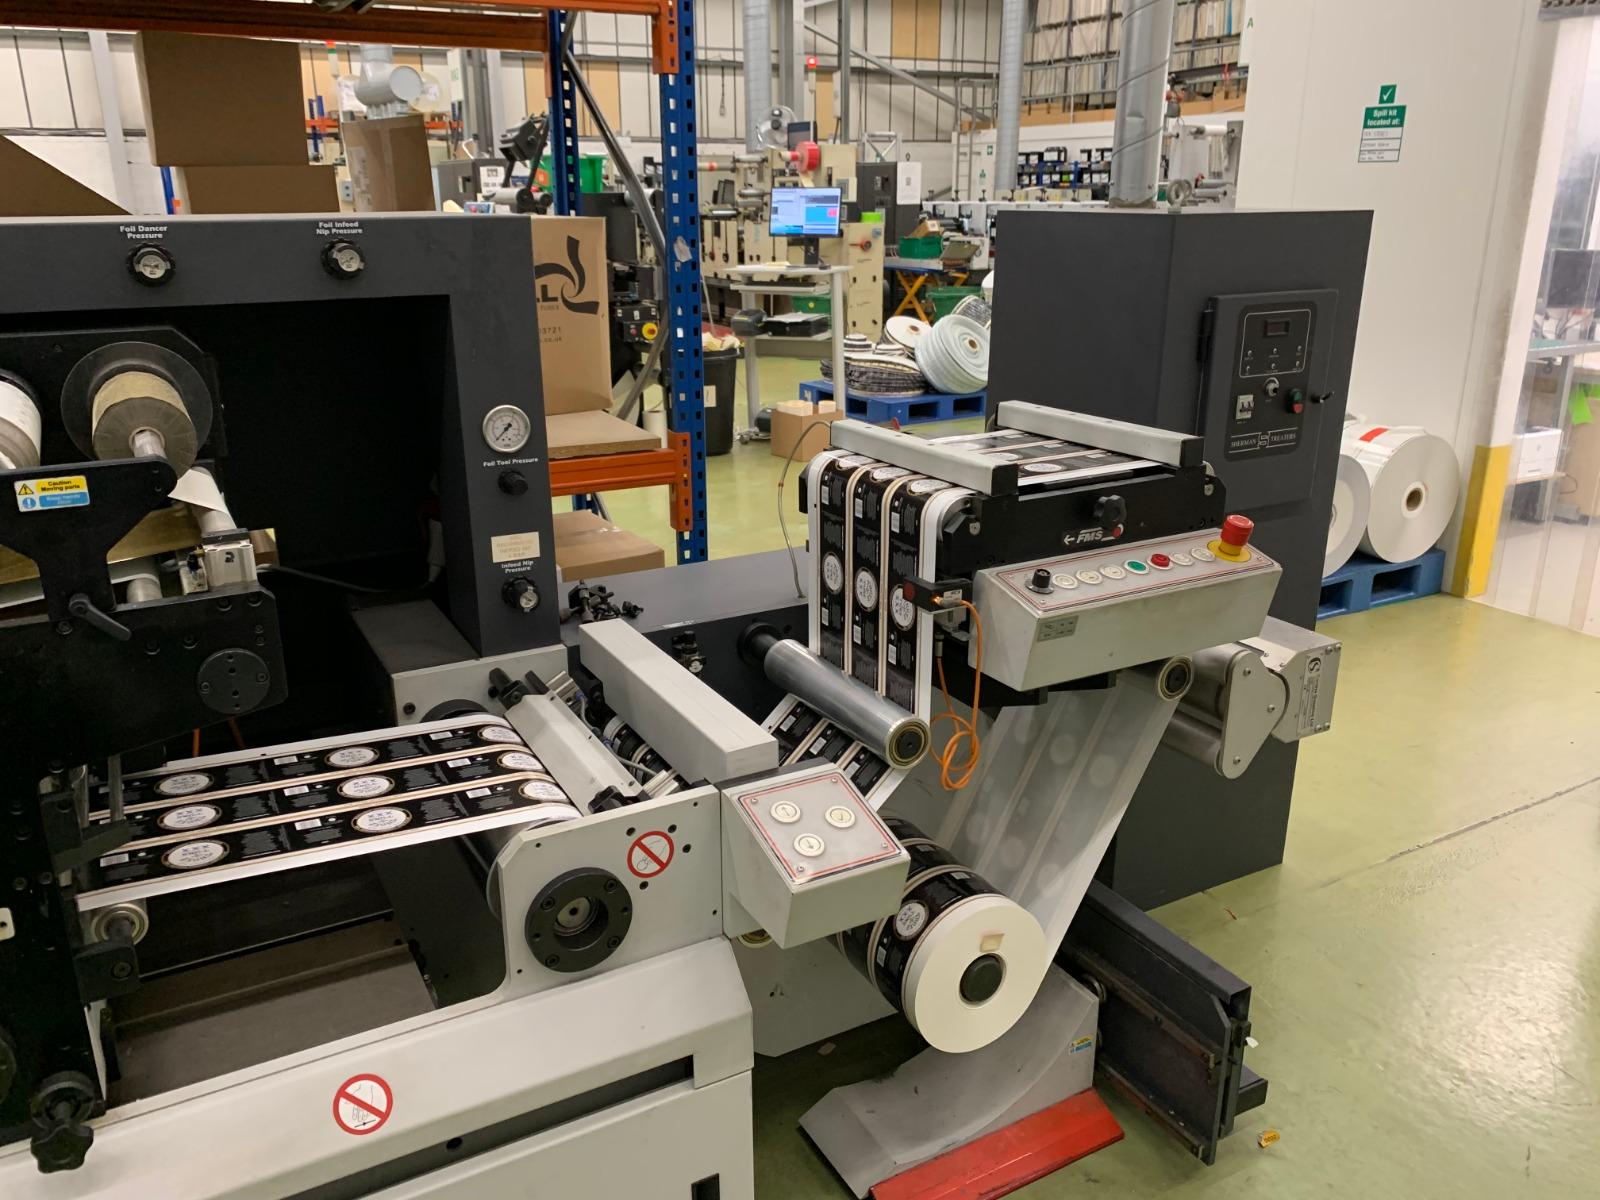 ABG Digicon Series 1 - Used Flexo Printing Presses and Used Flexographic Equipment-9